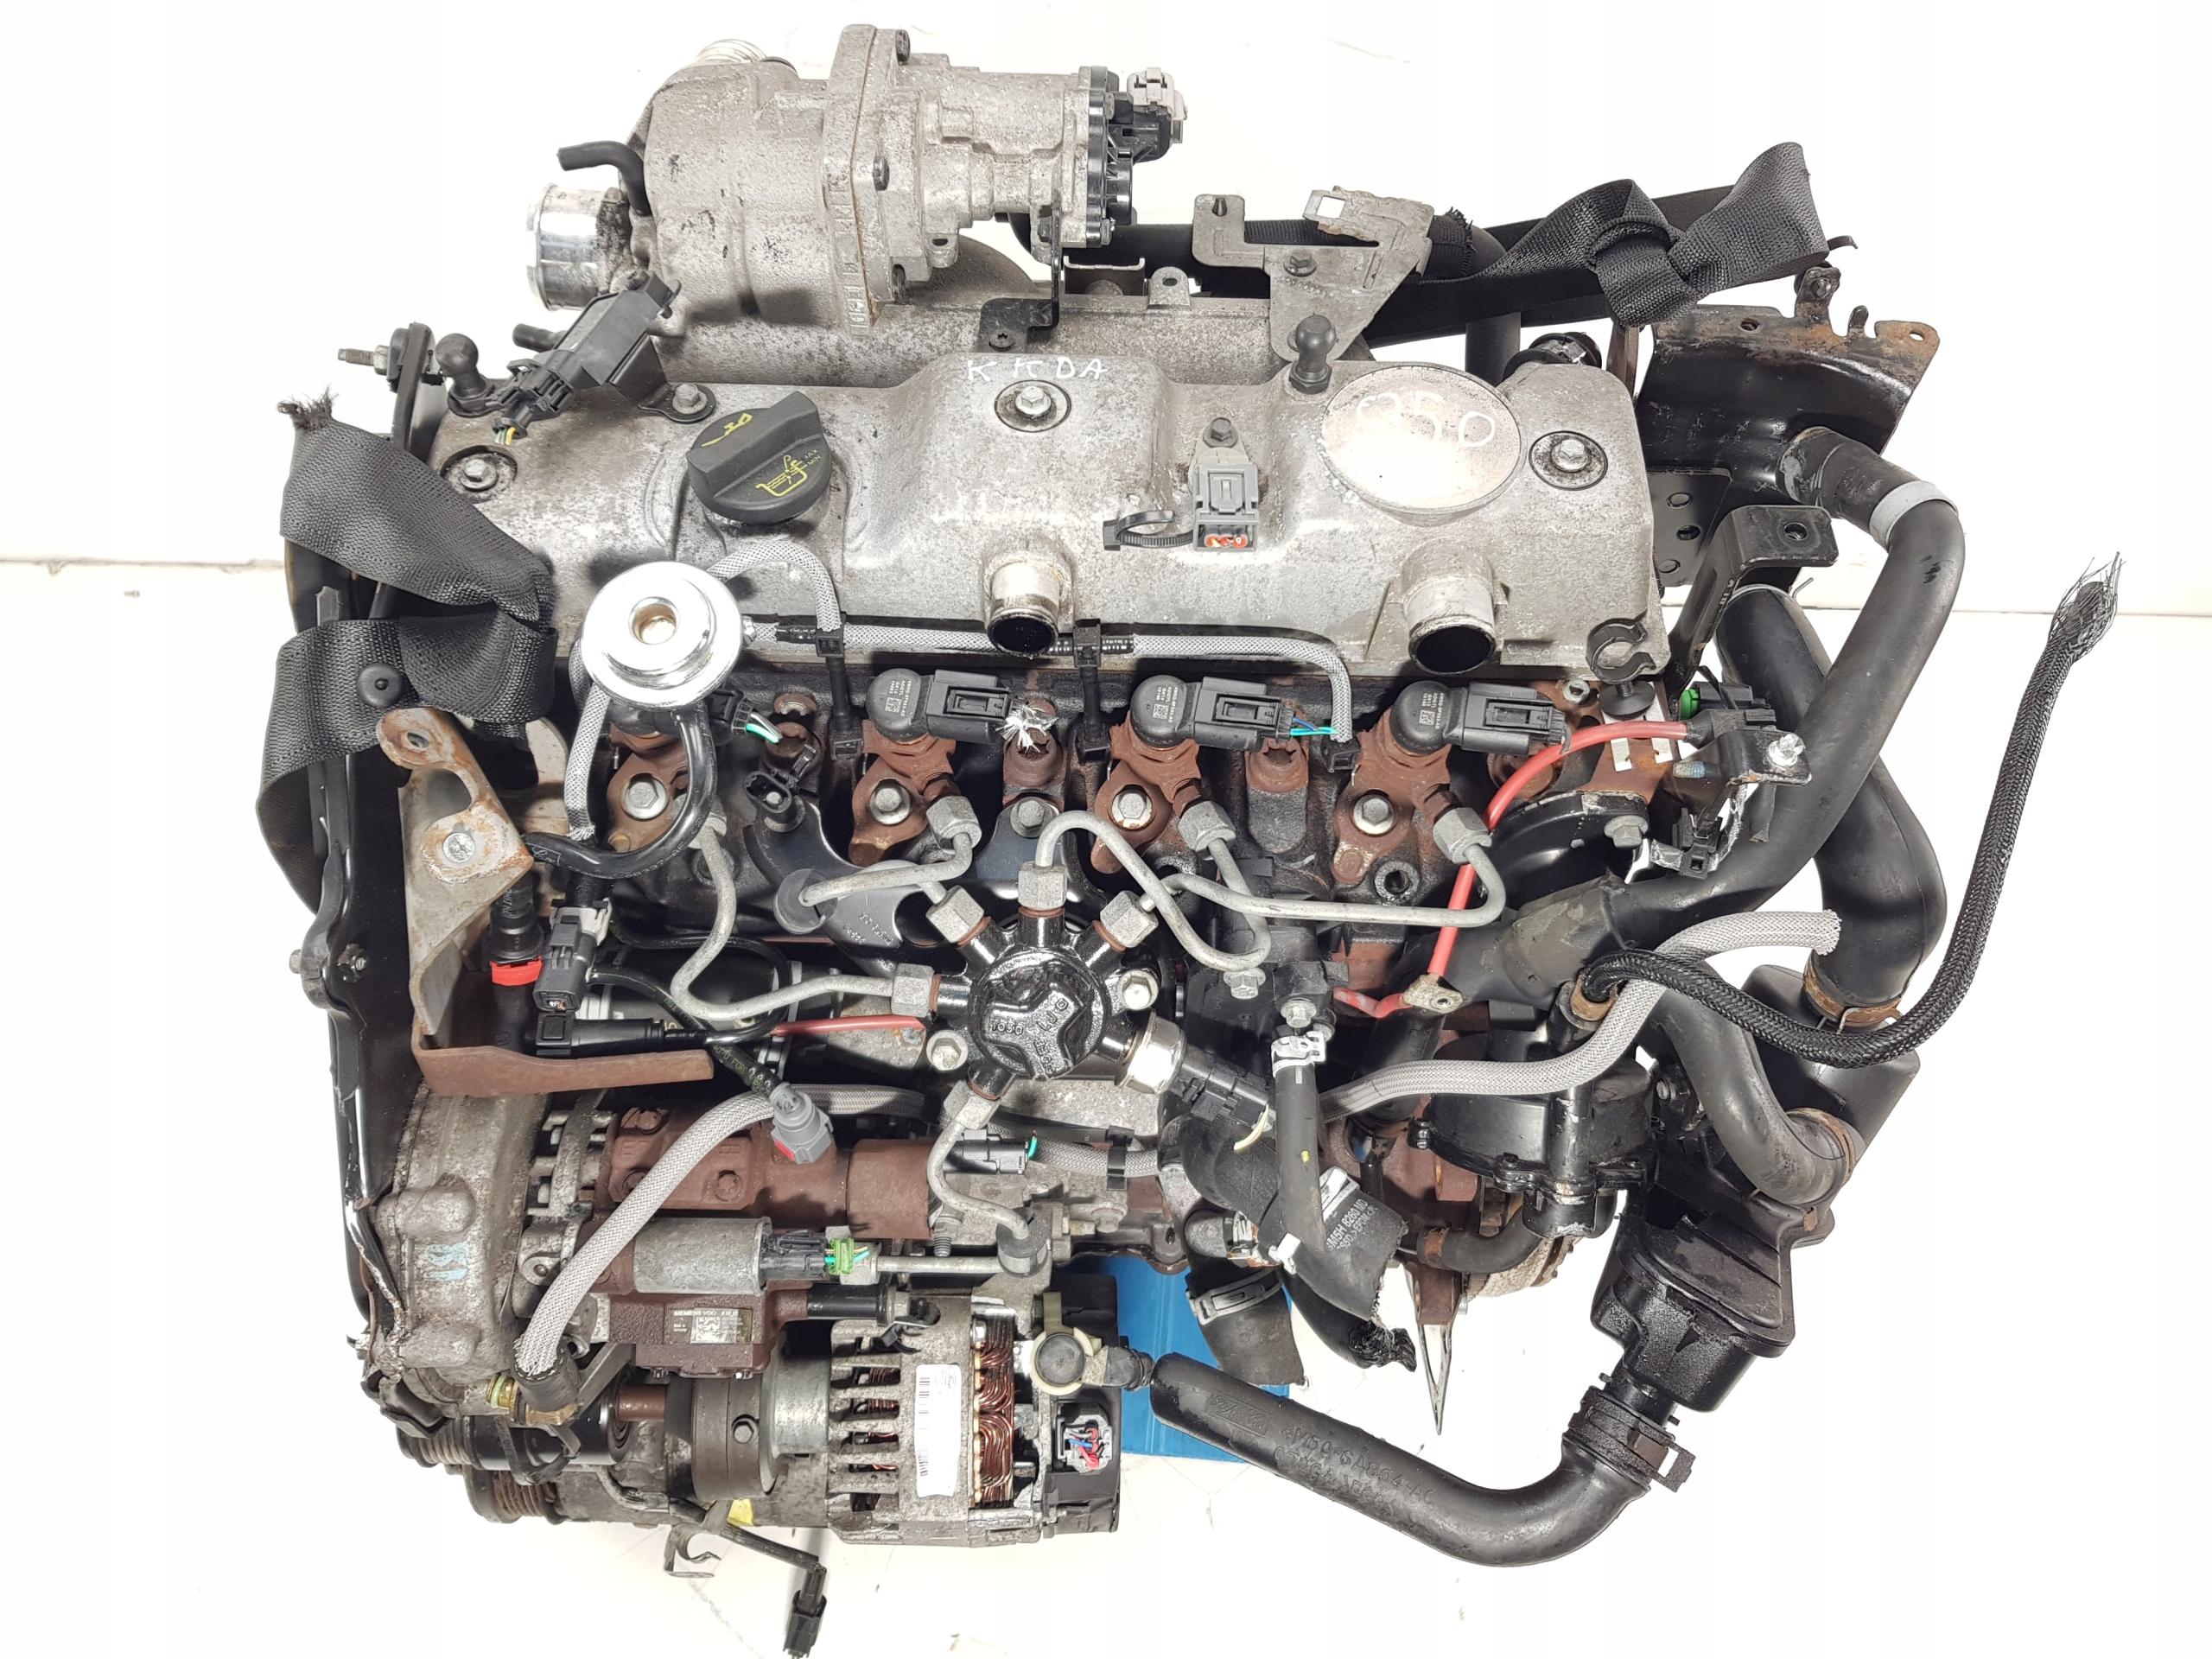 двигатель mondeo mk4 focus mk2 c-max 18tdci  ндс